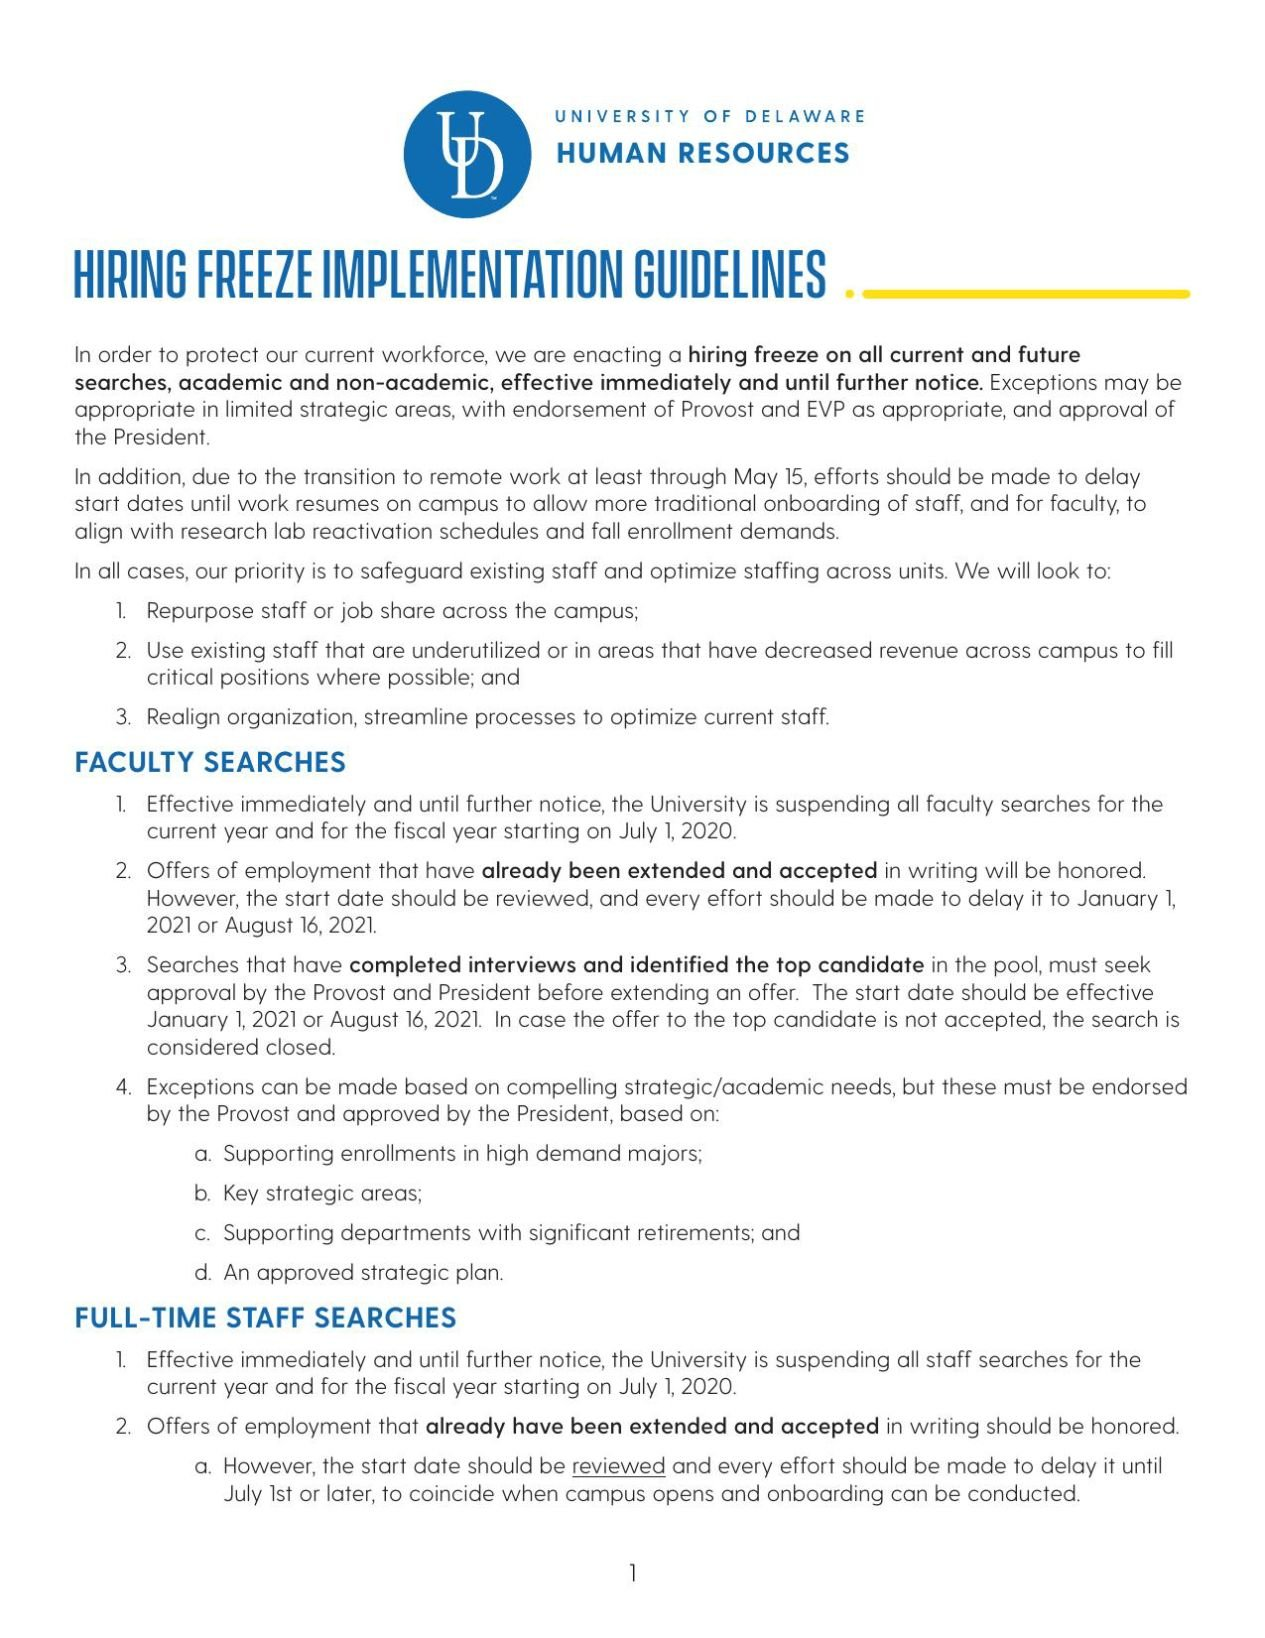 University of Delaware Hiring Freeze